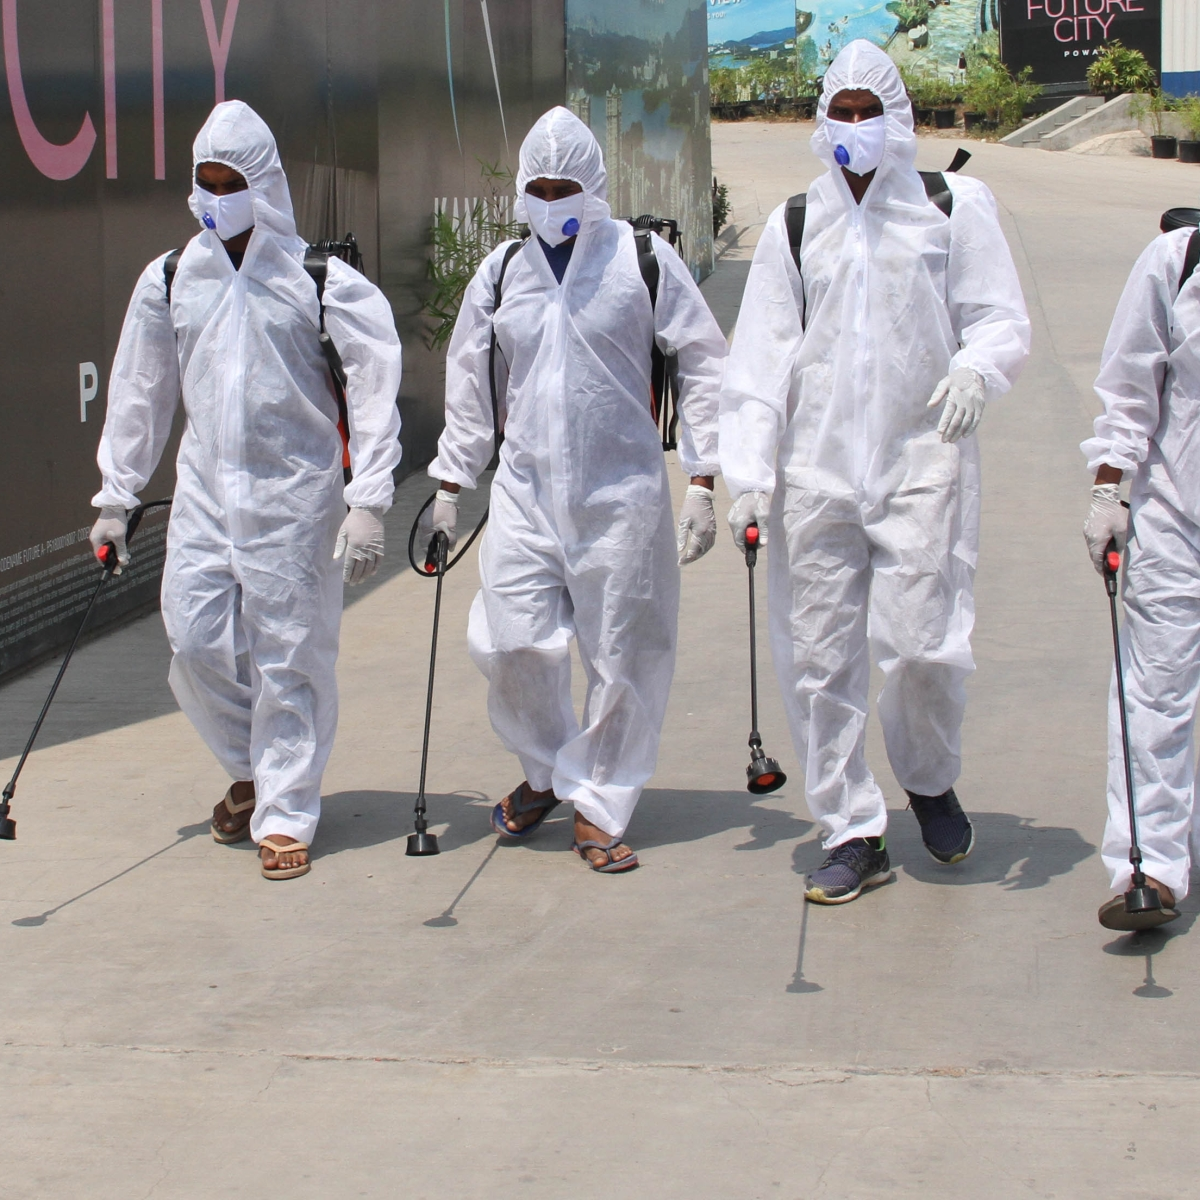 Coronavirus in Mumbai: Many contractual fire brigade staffers of Mira Bhayandar Municipal Corporation have not been paid for three months